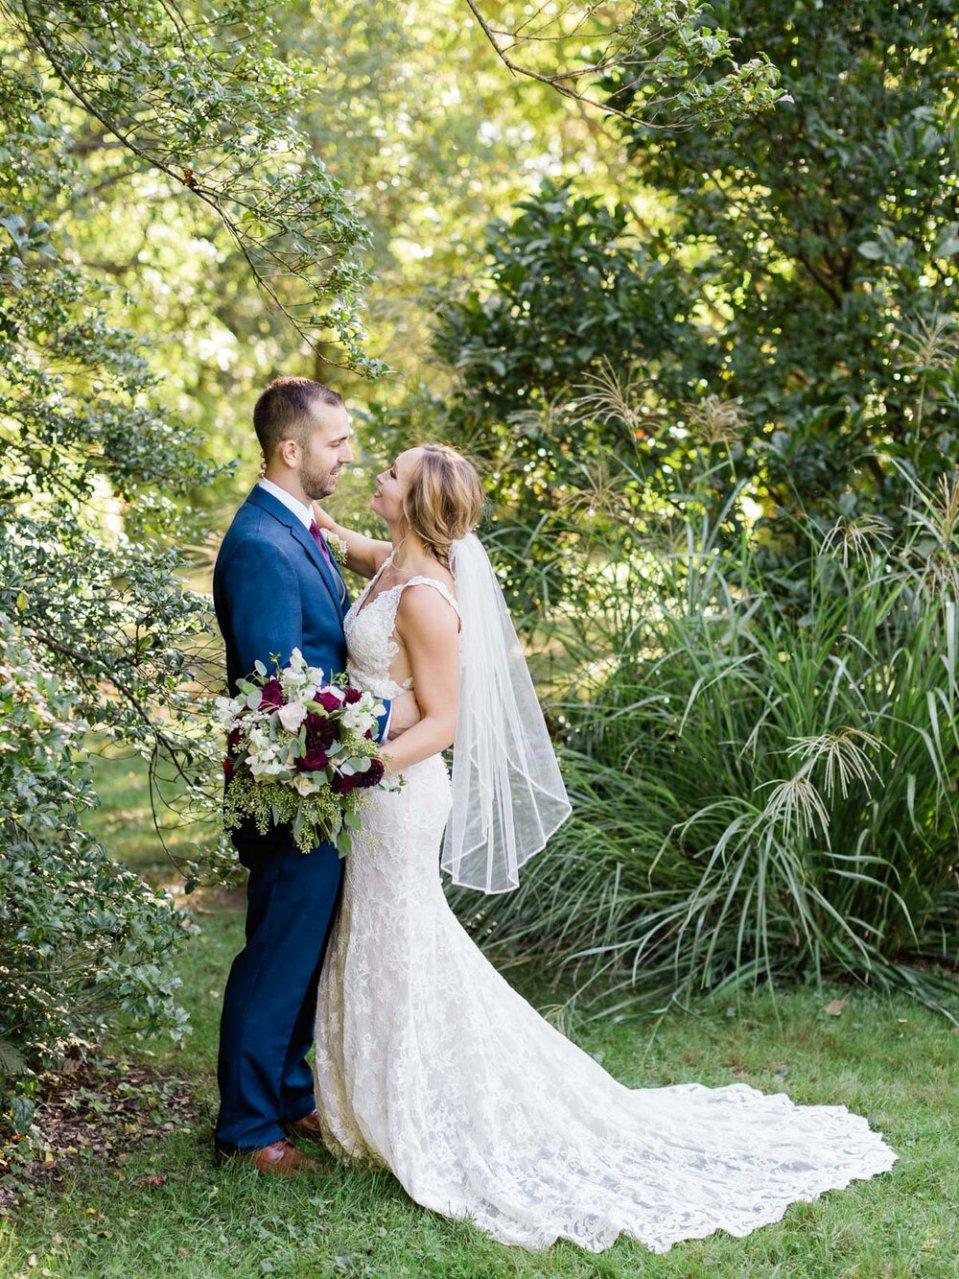 Elegant and Joyful Wedding at Crago Farms in Columbus, Ohio-42.jpg